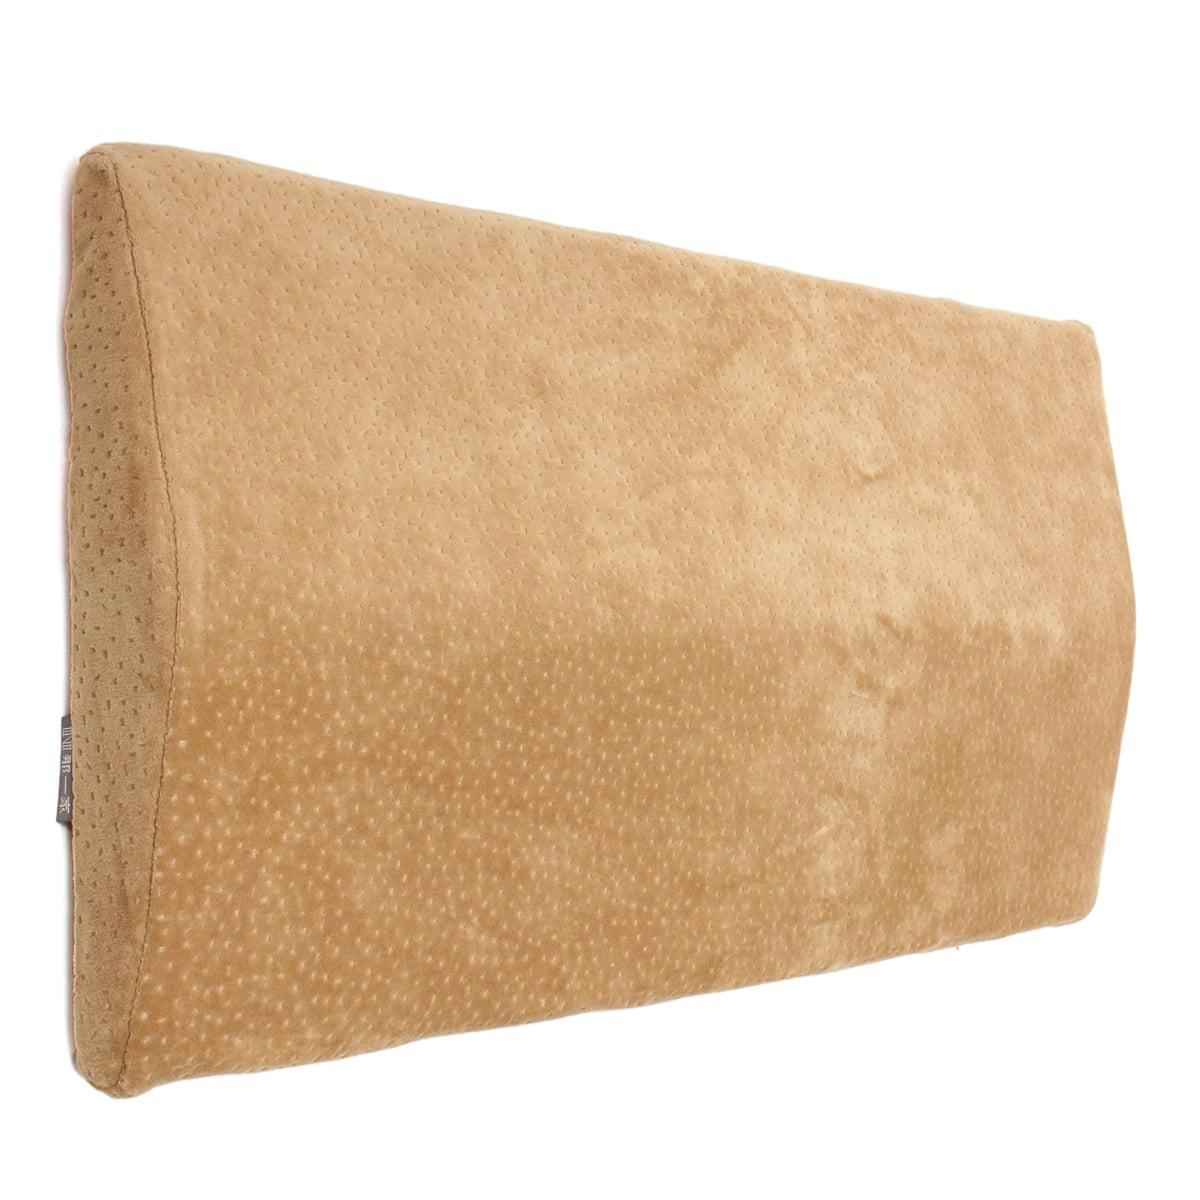 1 Pcs Lumbar Pillow Memory Foam Sleeping Waist Back Support Pad Pain Relief Cushion